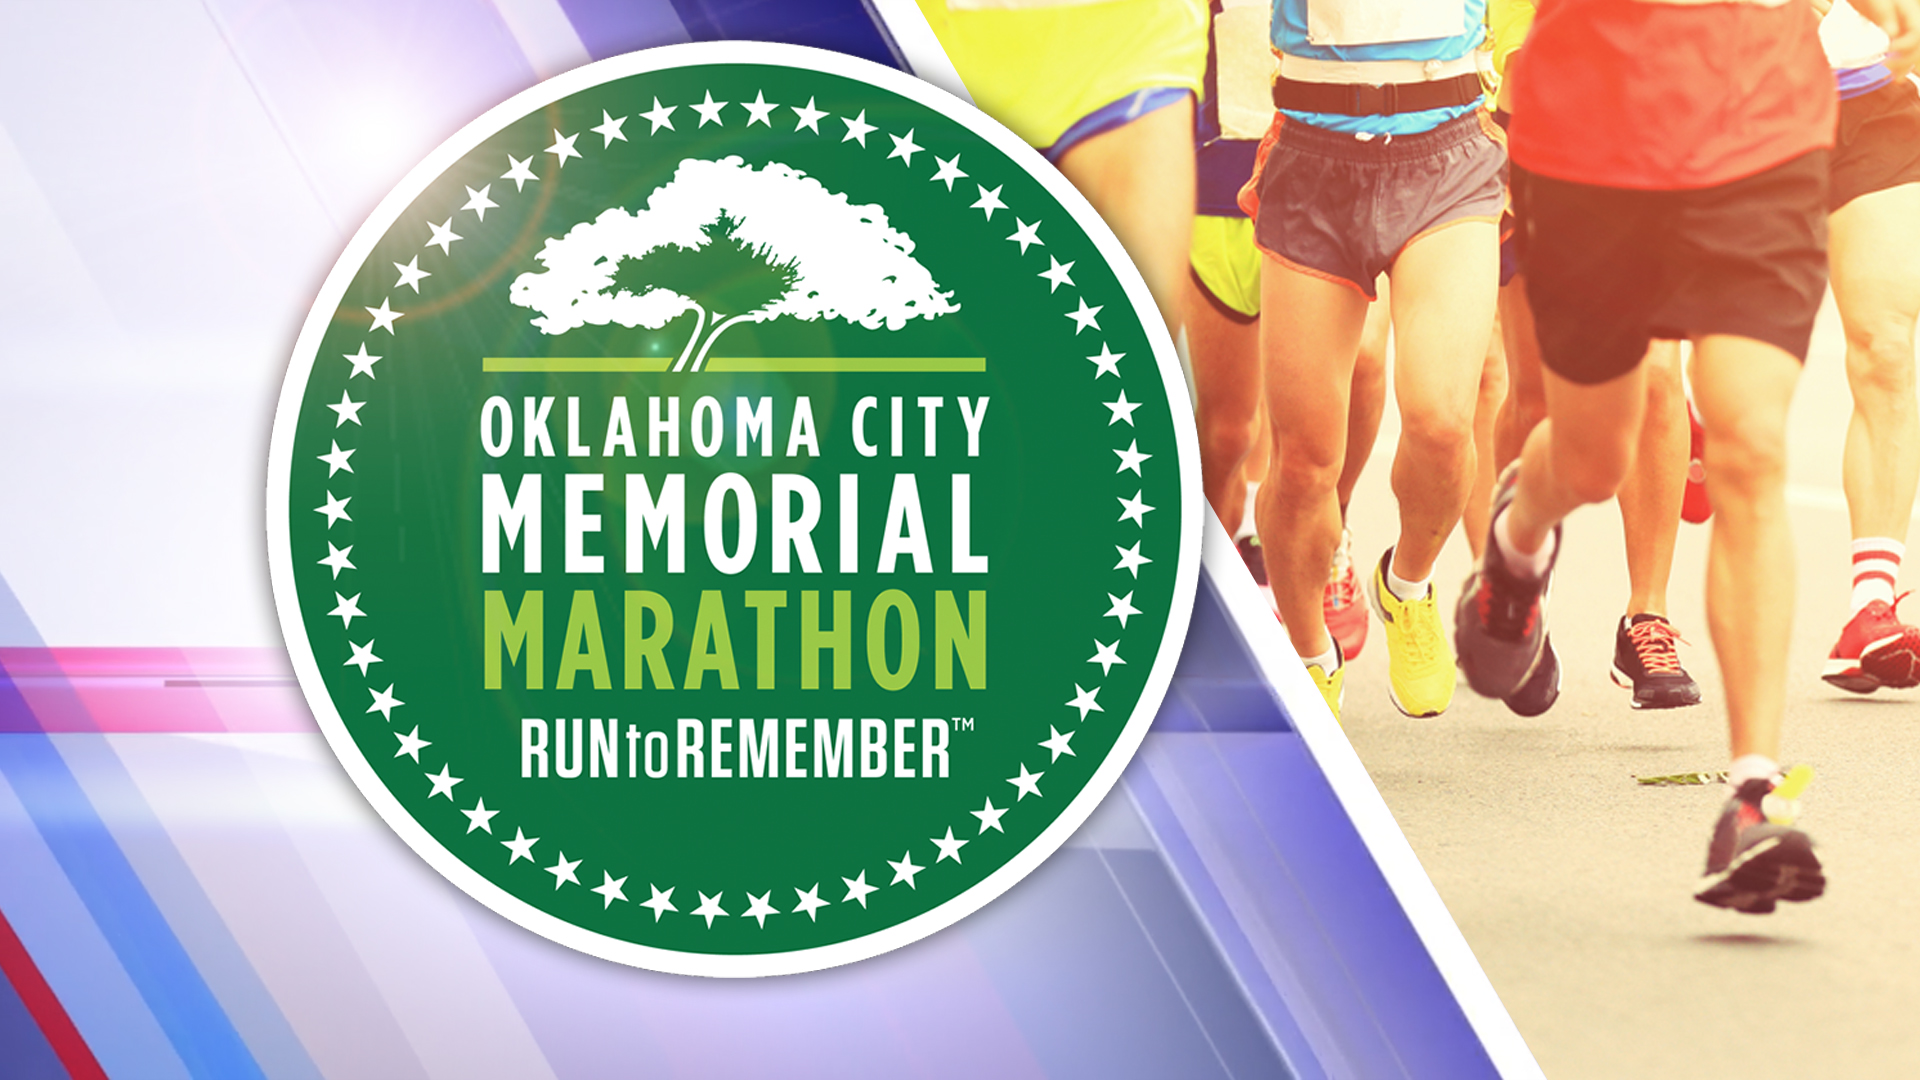 Oklahoma City Memorial Marathon logo graphic